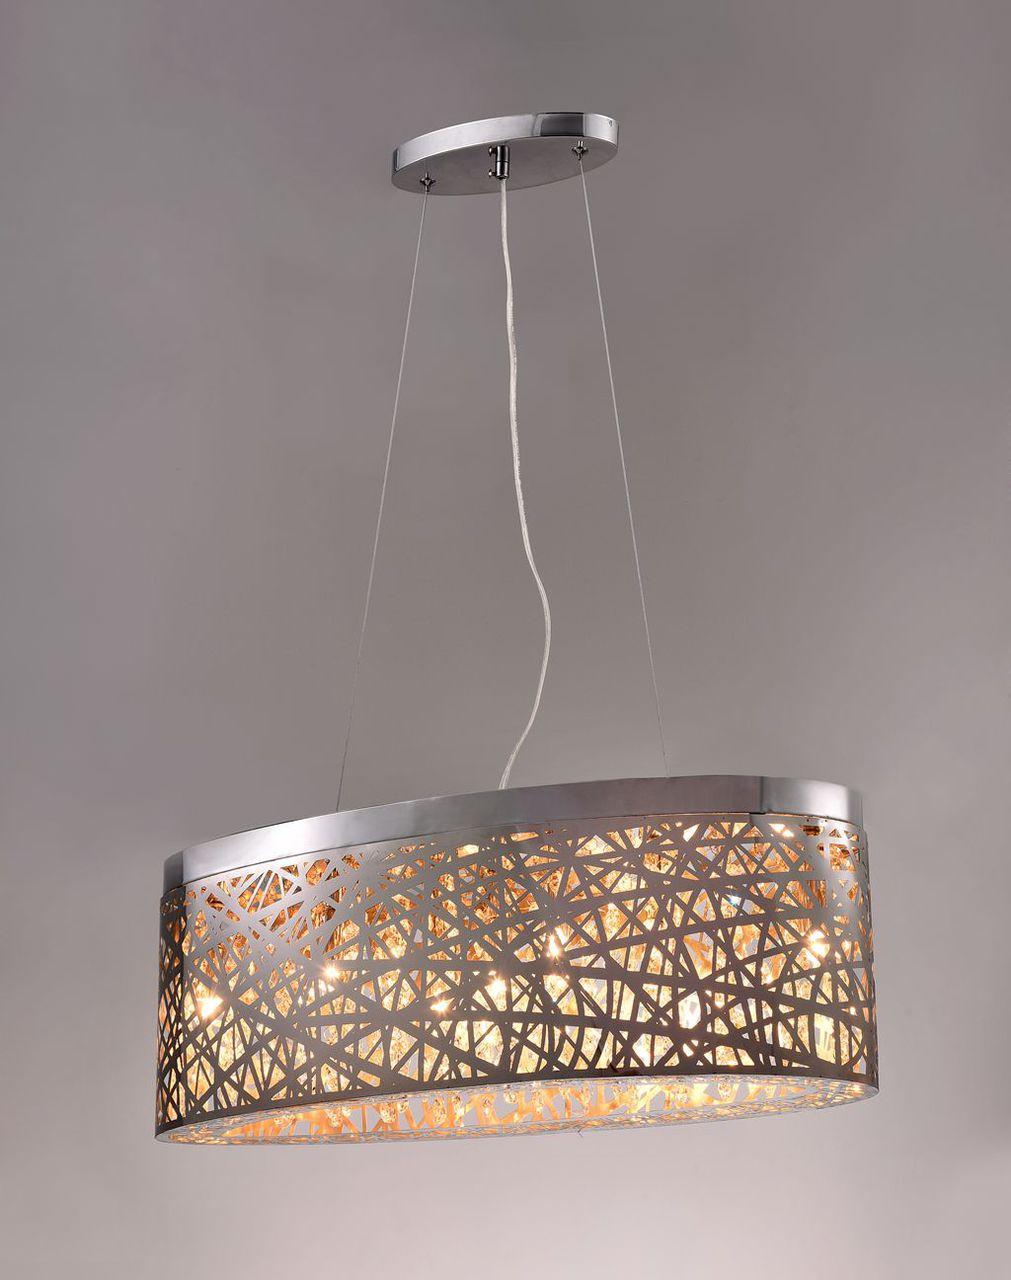 Seven lamp oval pendant light fixture toronto vaughan home decor seven lamp oval pendant light fixture aloadofball Images